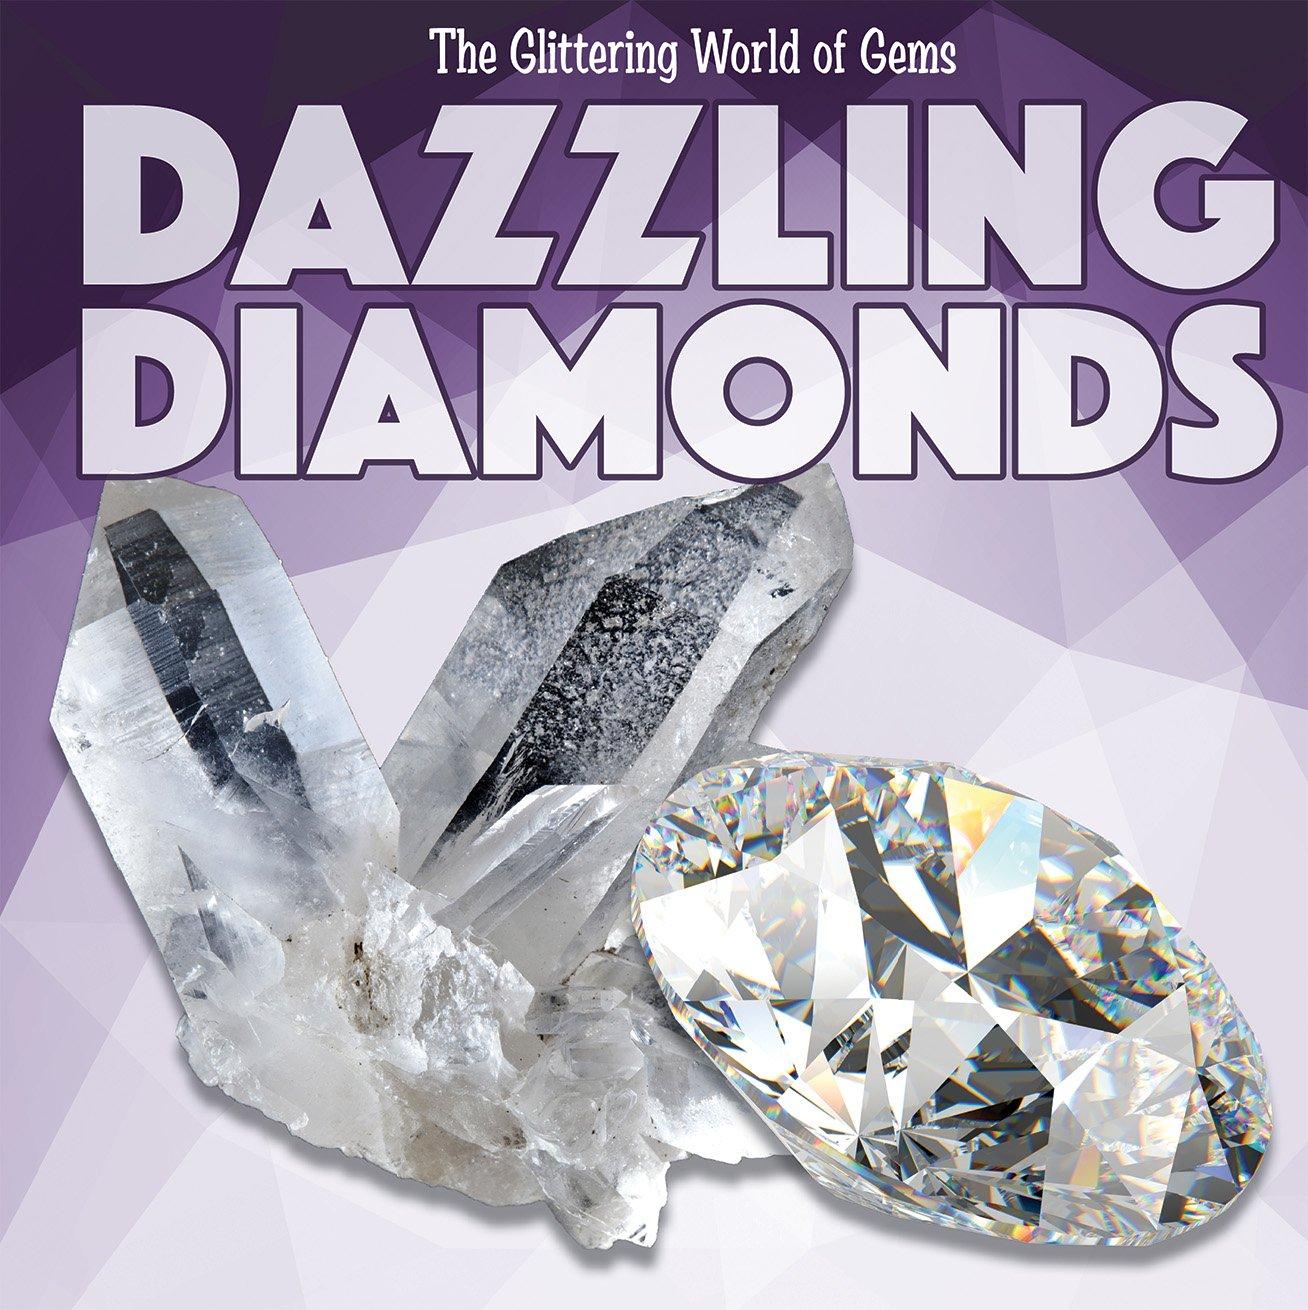 Dazzling Diamonds (Glittering World of Gems)